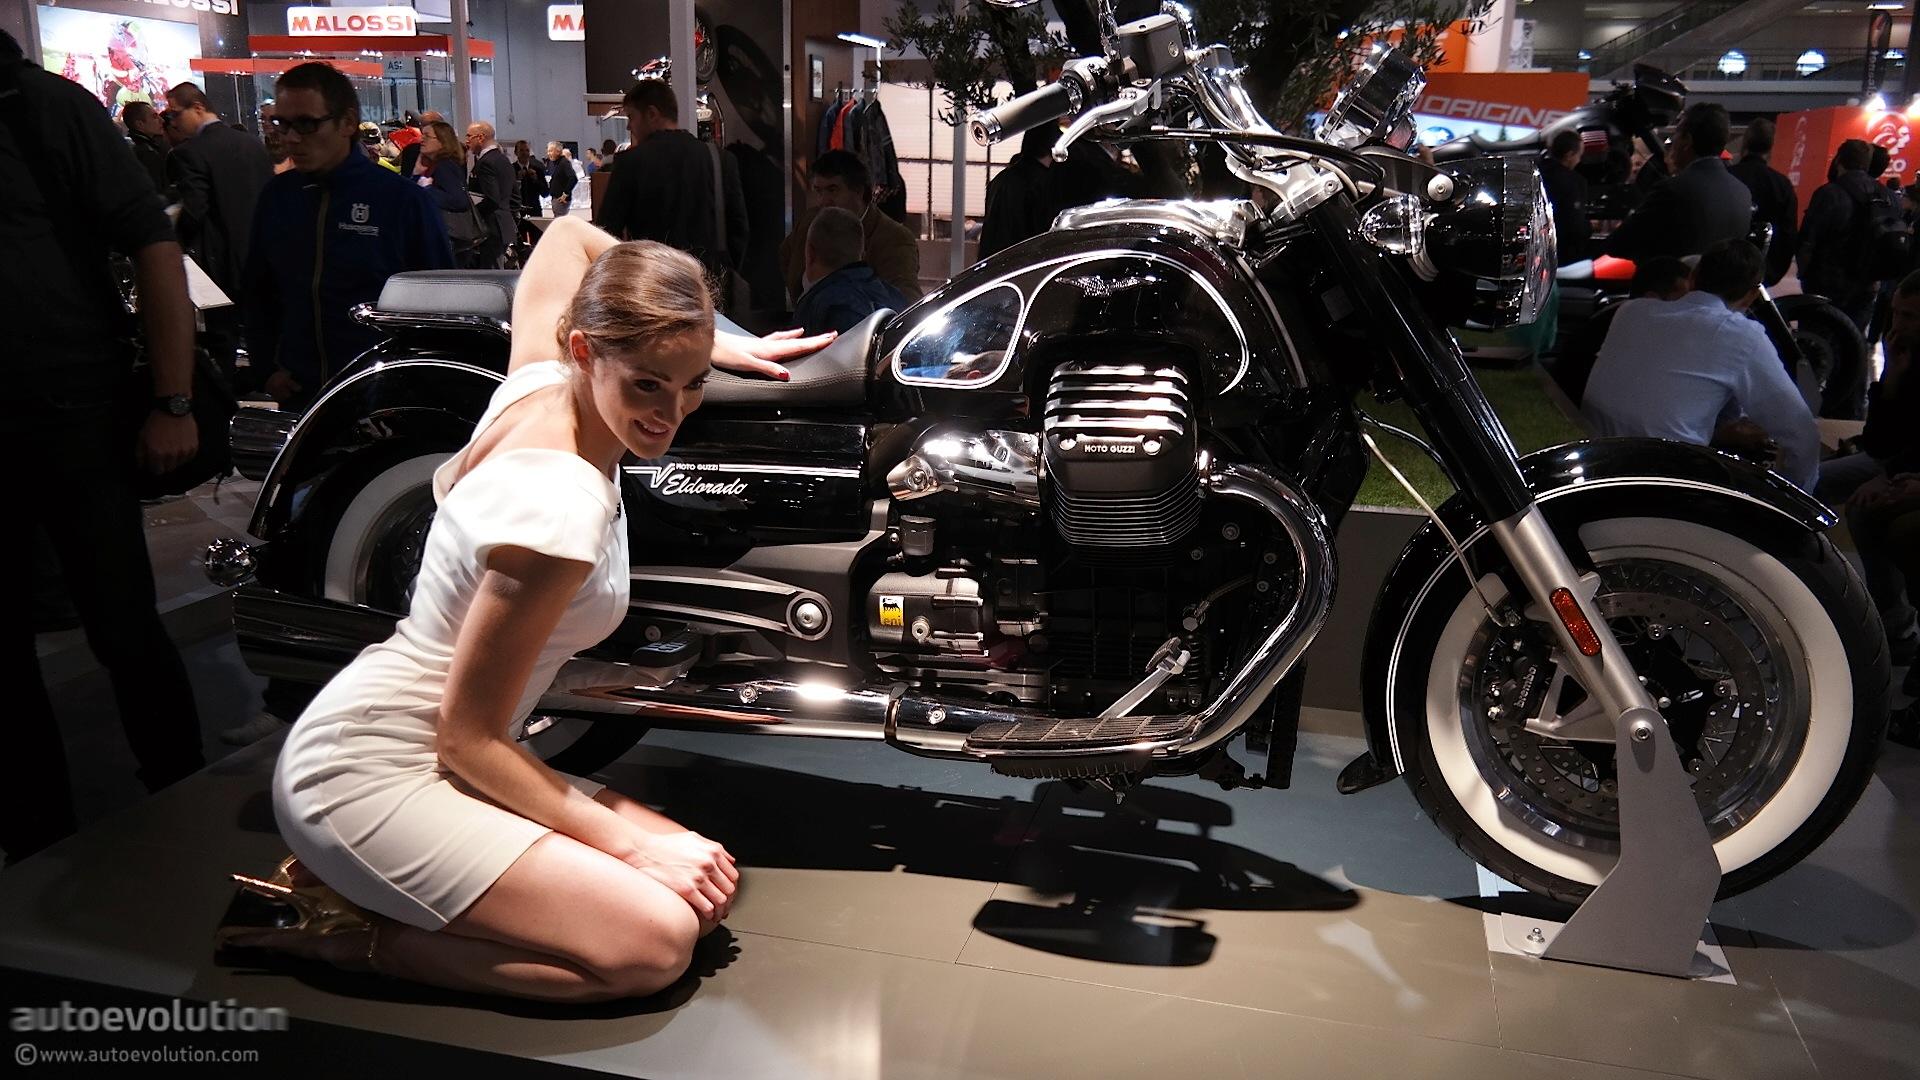 Black motorbike showgirls, sexy yiung winen frin atlanta free porn